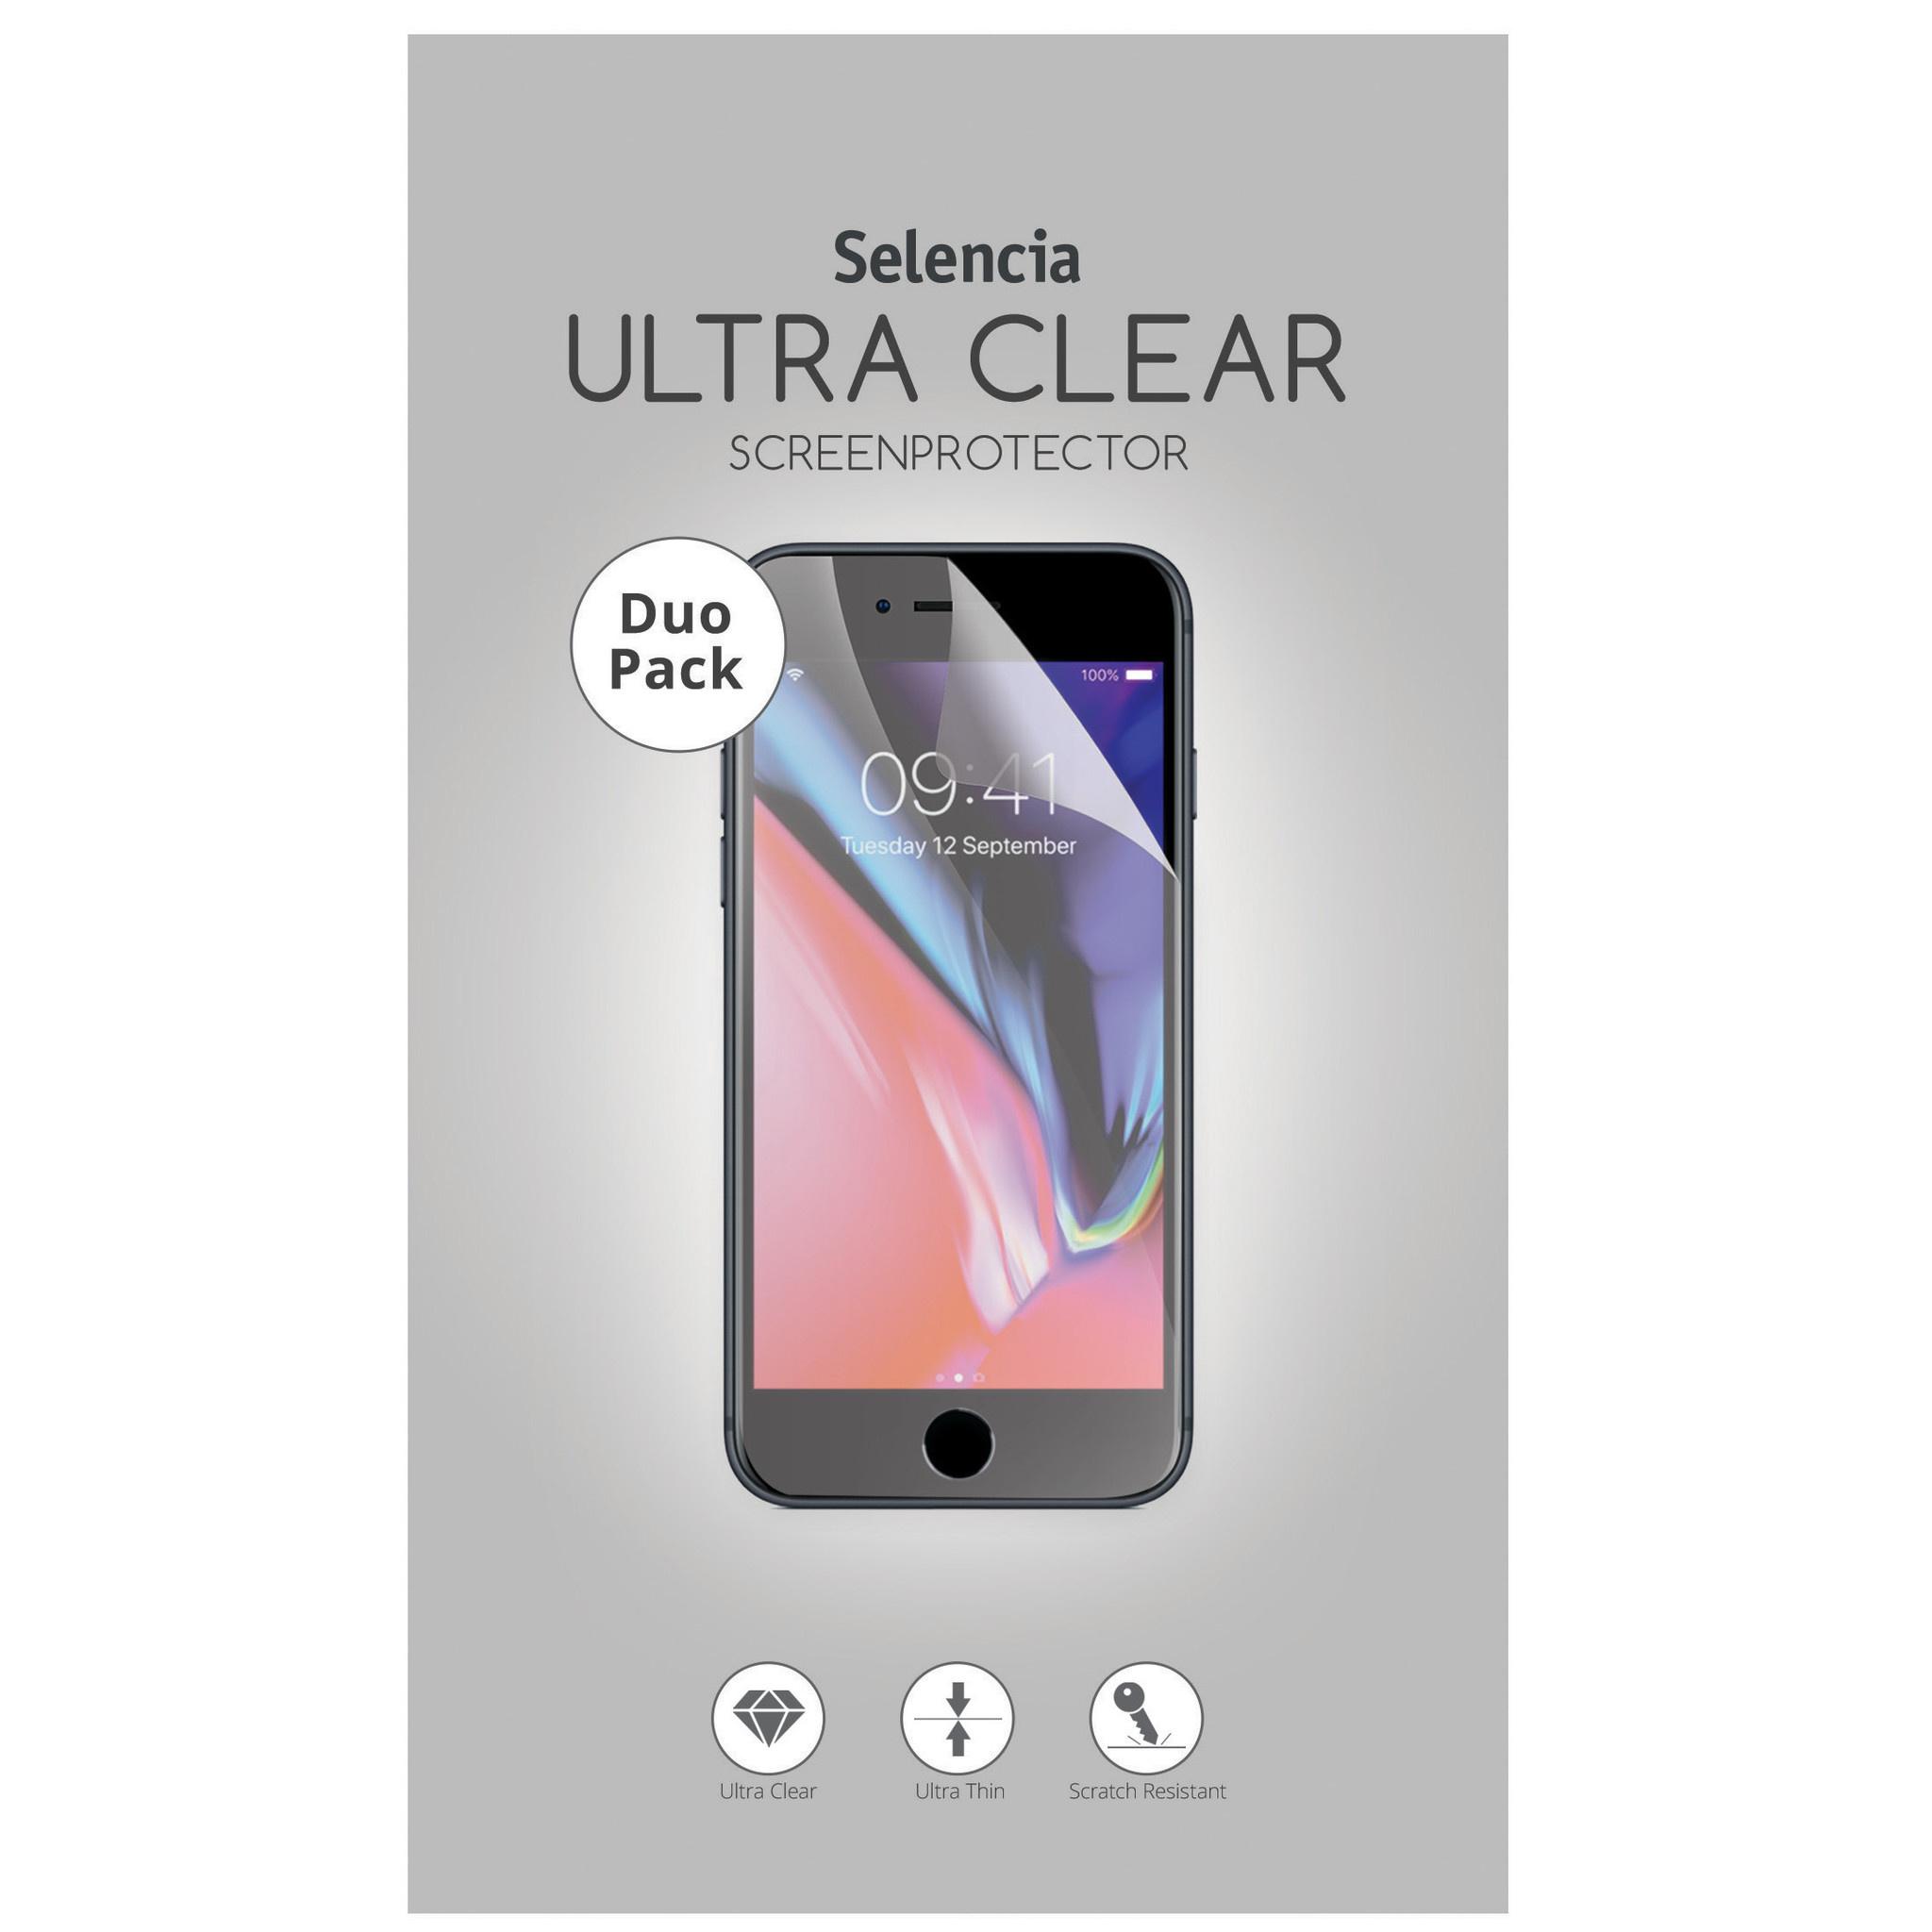 Selencia Duo Pack Screenprotector für das Motorola Moto G6